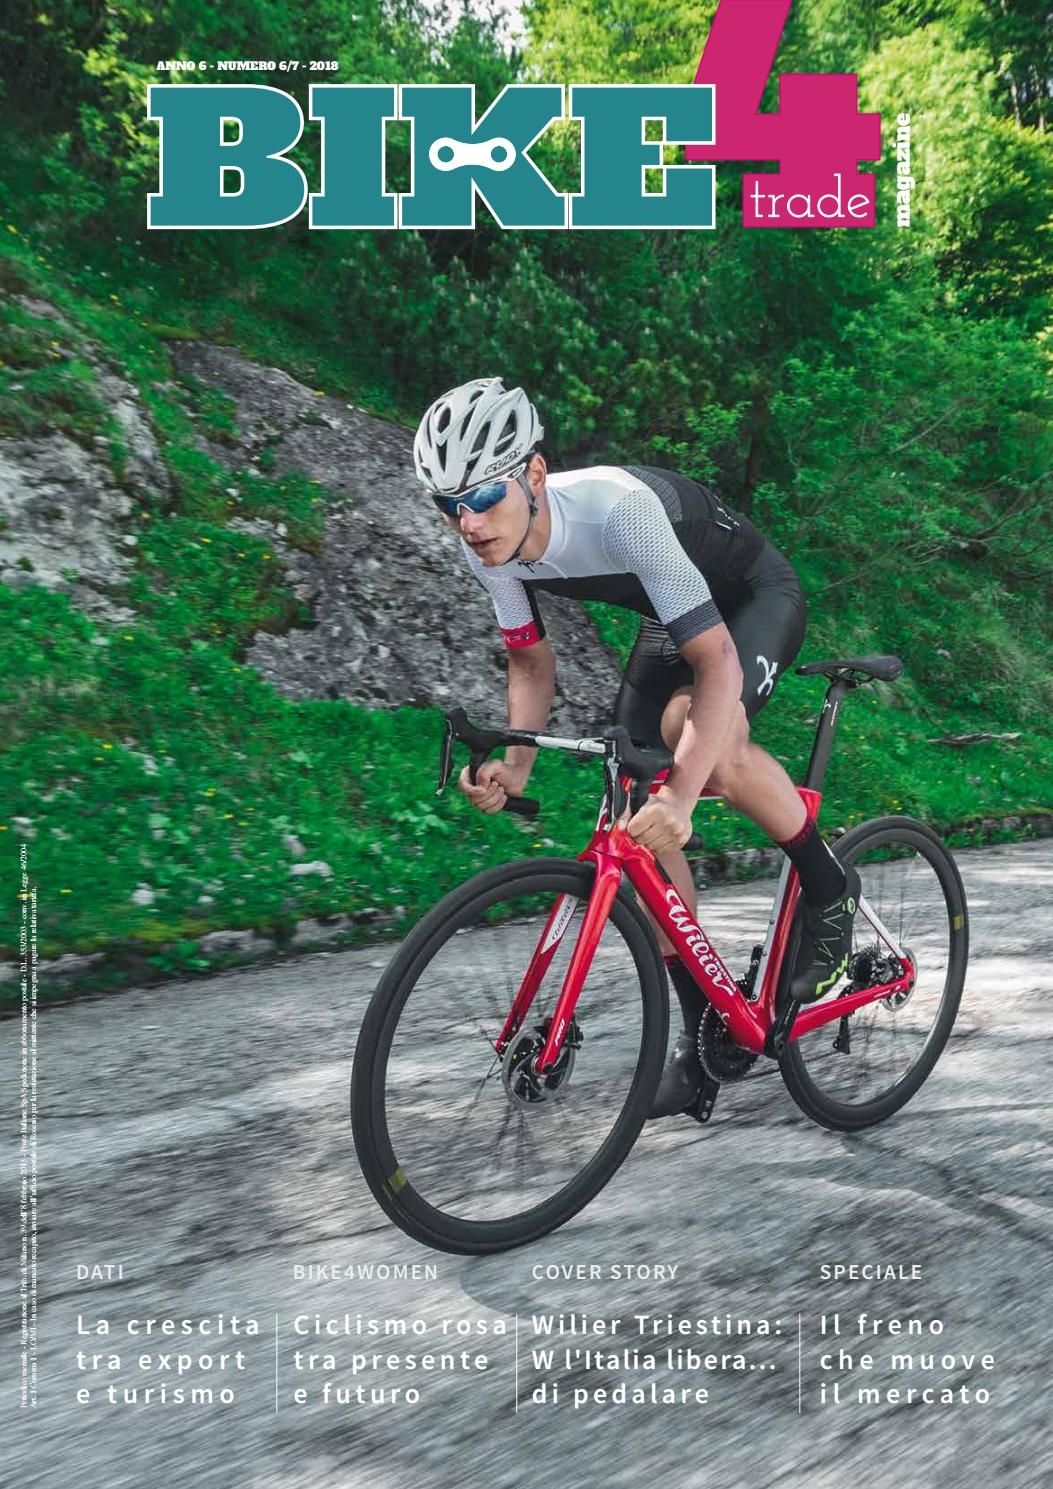 MANOPOLE VELO SPUGNA VERDE BIANCO BICI CORSA MTB BMX BIKE FOAM GRIPS GREEN WHITE